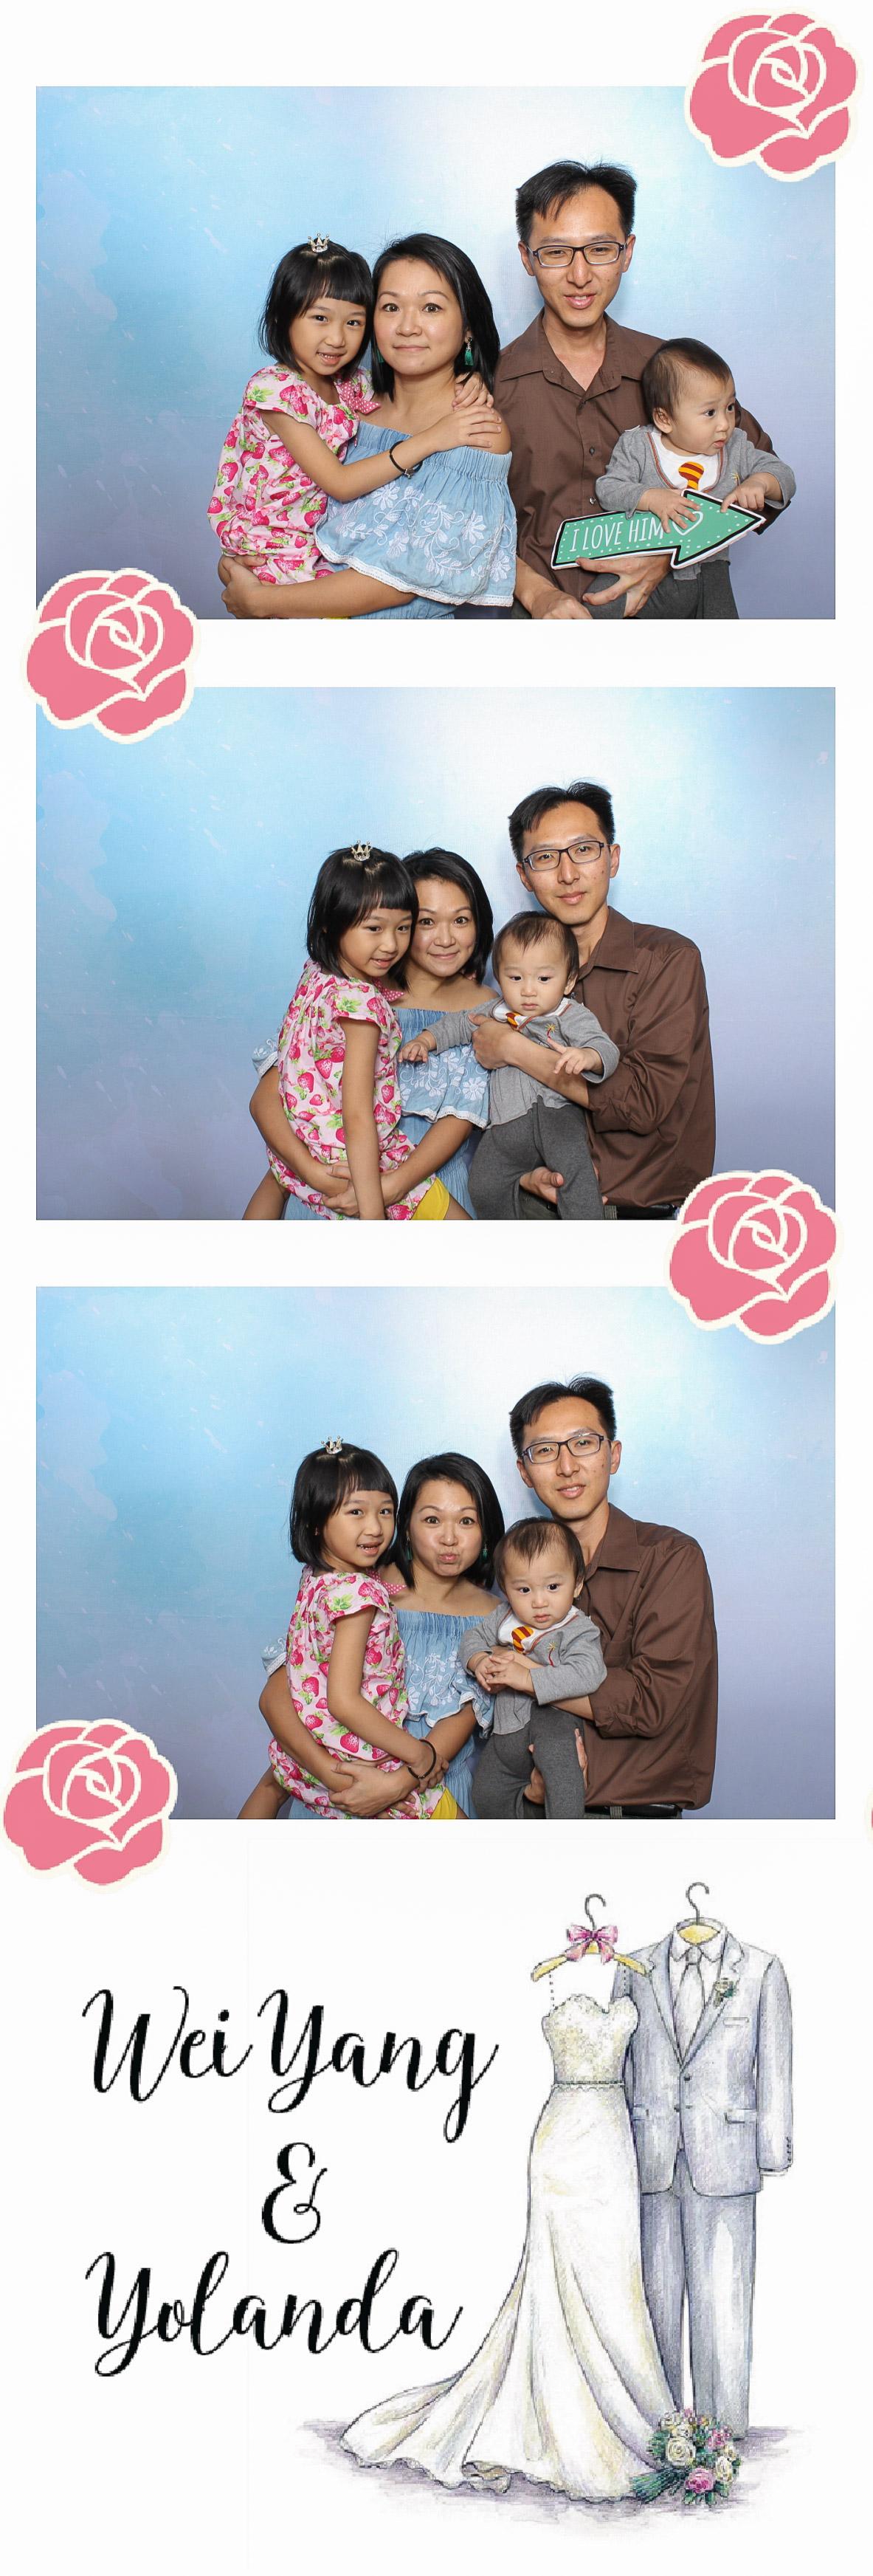 Photobooth 1706-27